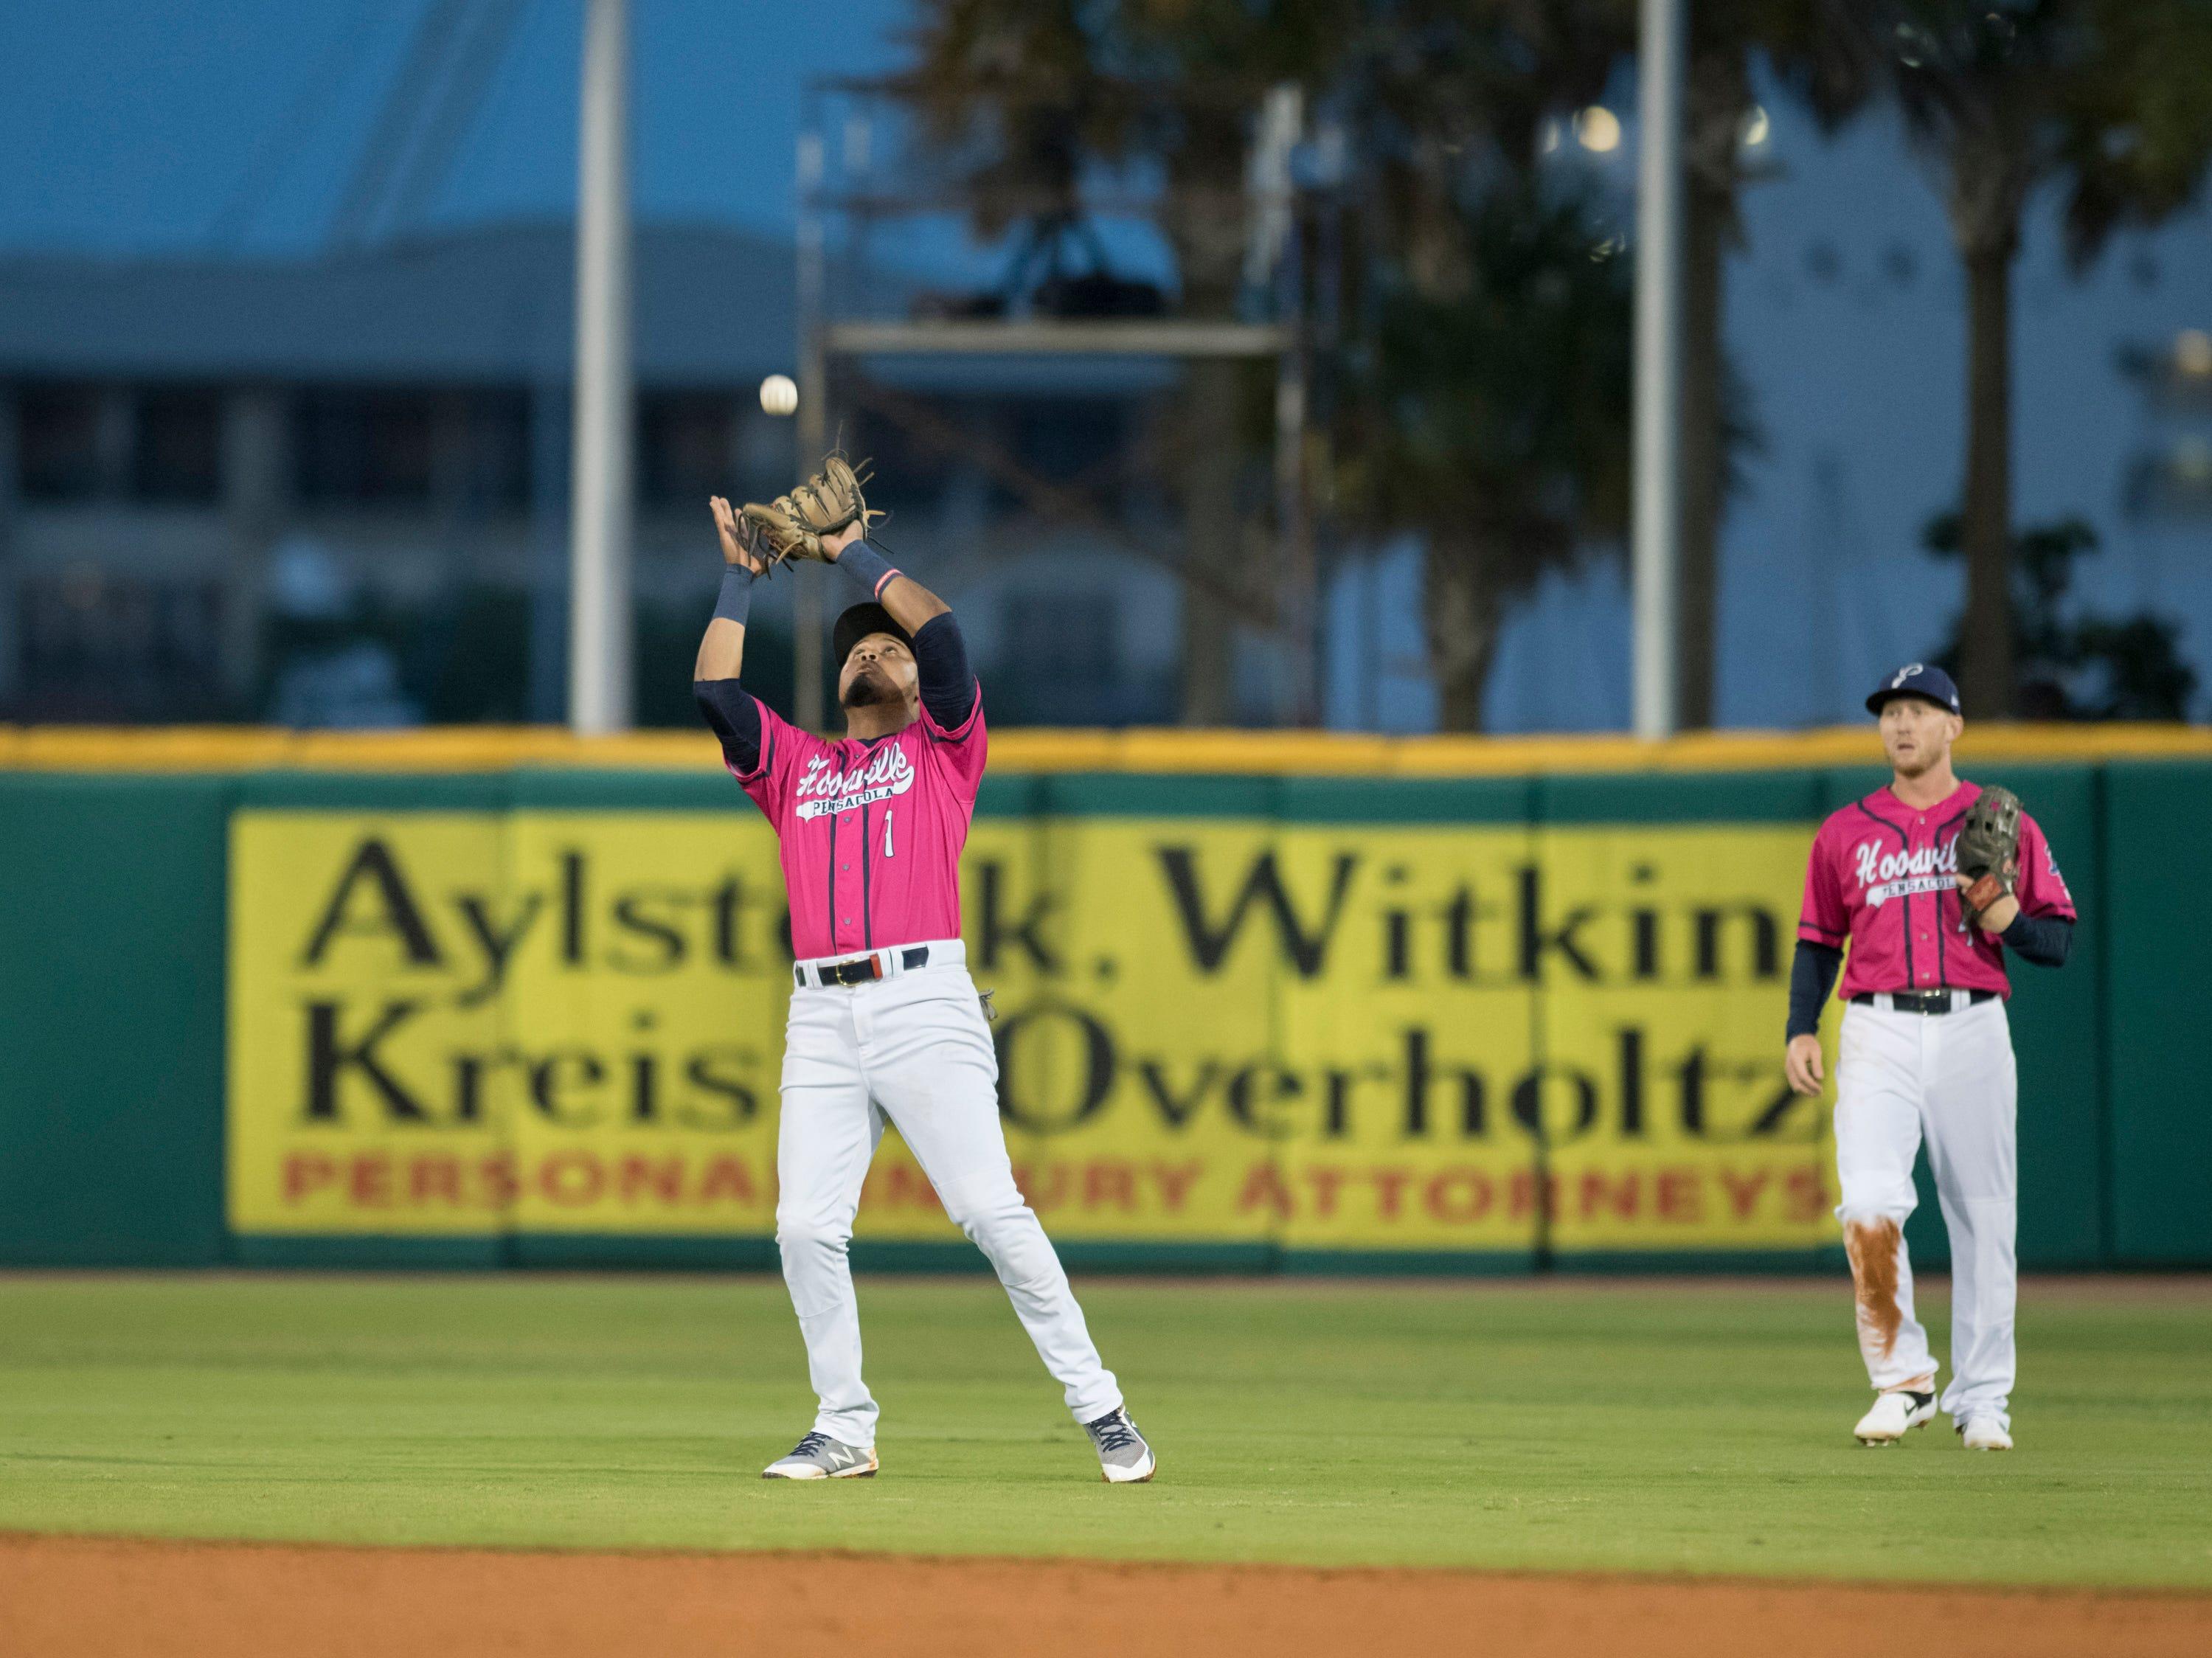 Second baseman Luis Arraez (1) settles under a pop up for an out during the Jacksonville Jumbo Shrimp vs Pensacola Blue Wahoos baseball game in Pensacola on Friday, April 12, 2019.